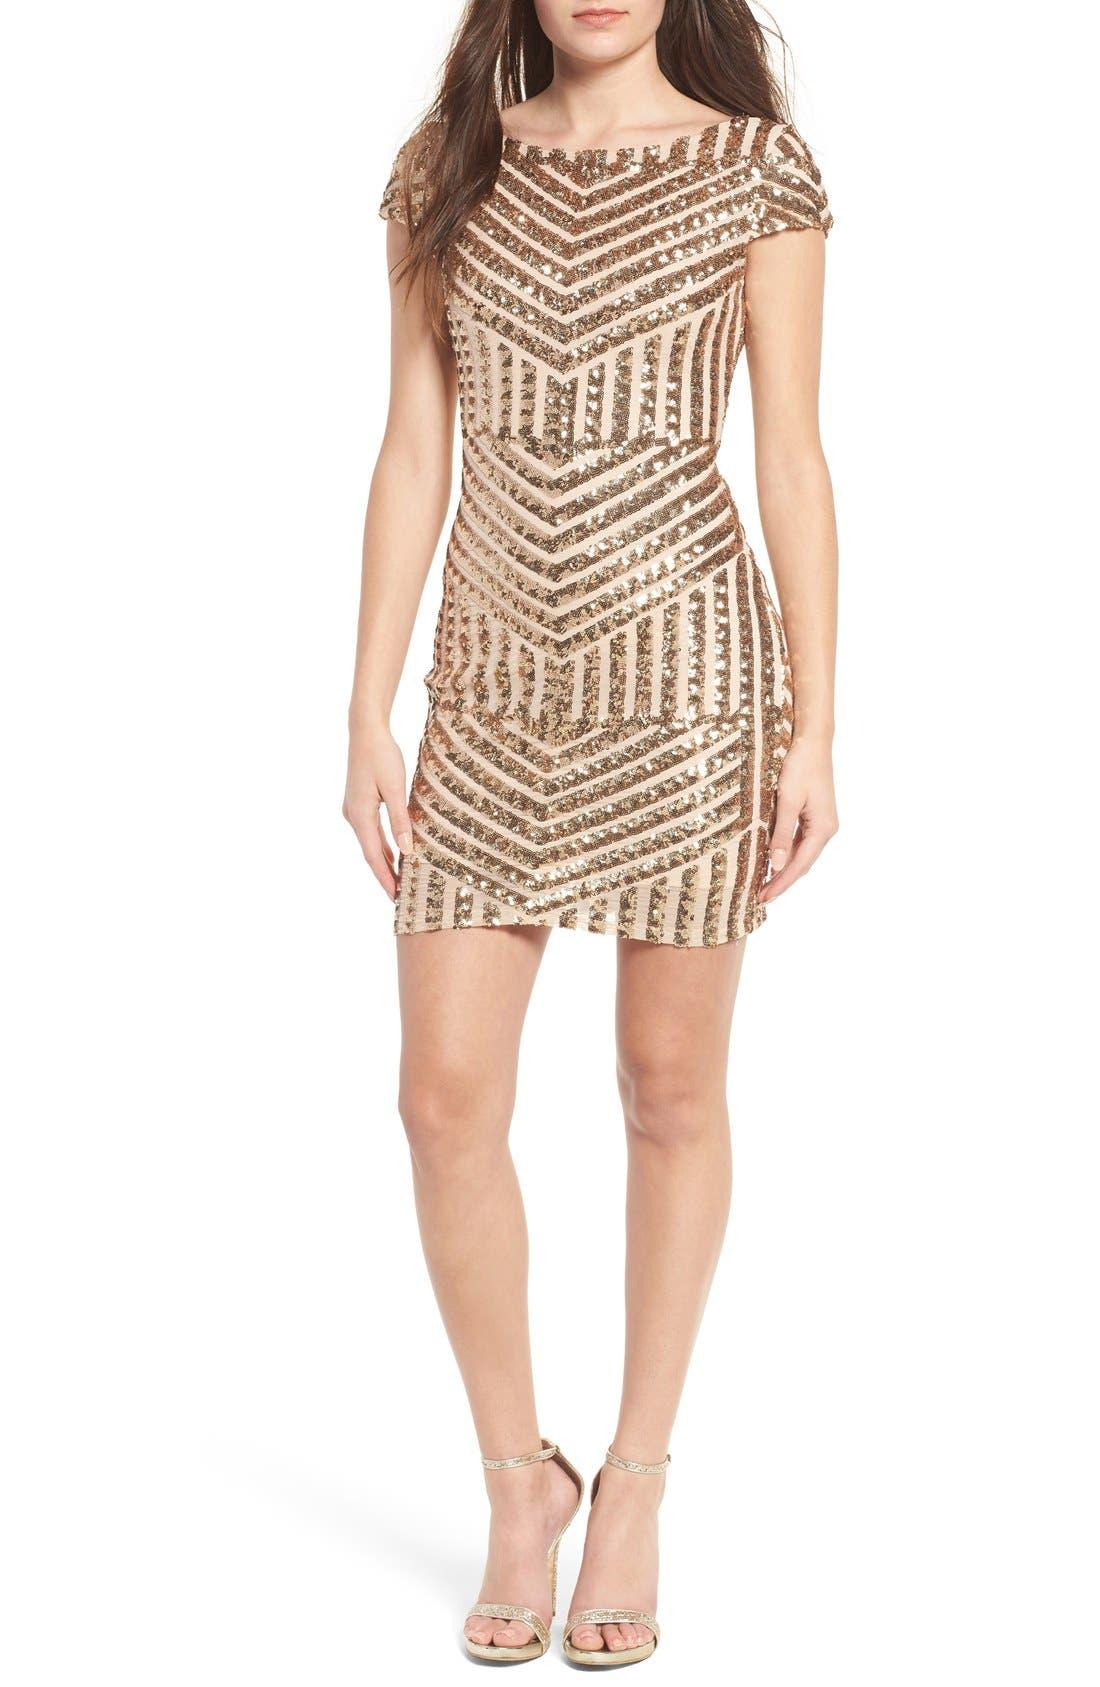 Alternate Image 1 Selected - TFNC Colette Sequin Body-Con Dress